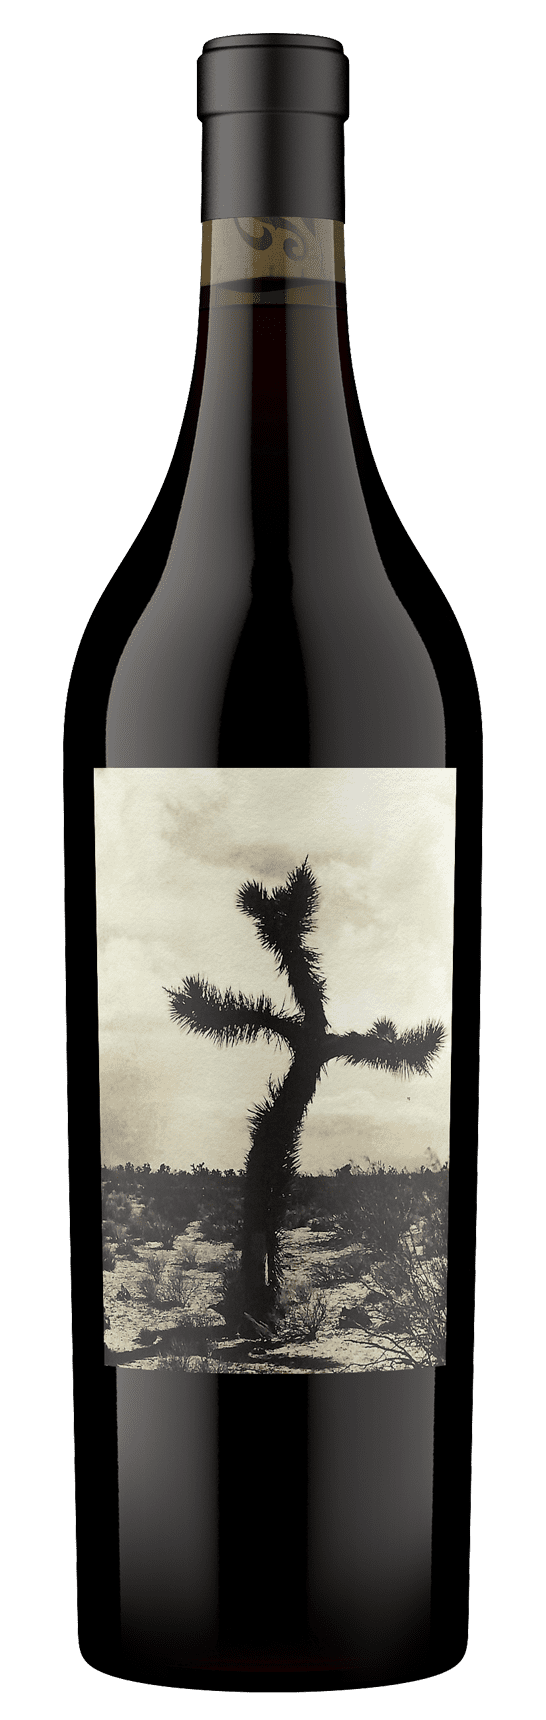 2019 Spiritual Thirst, Red Wine, Amador County, Shake Ridge Ranch